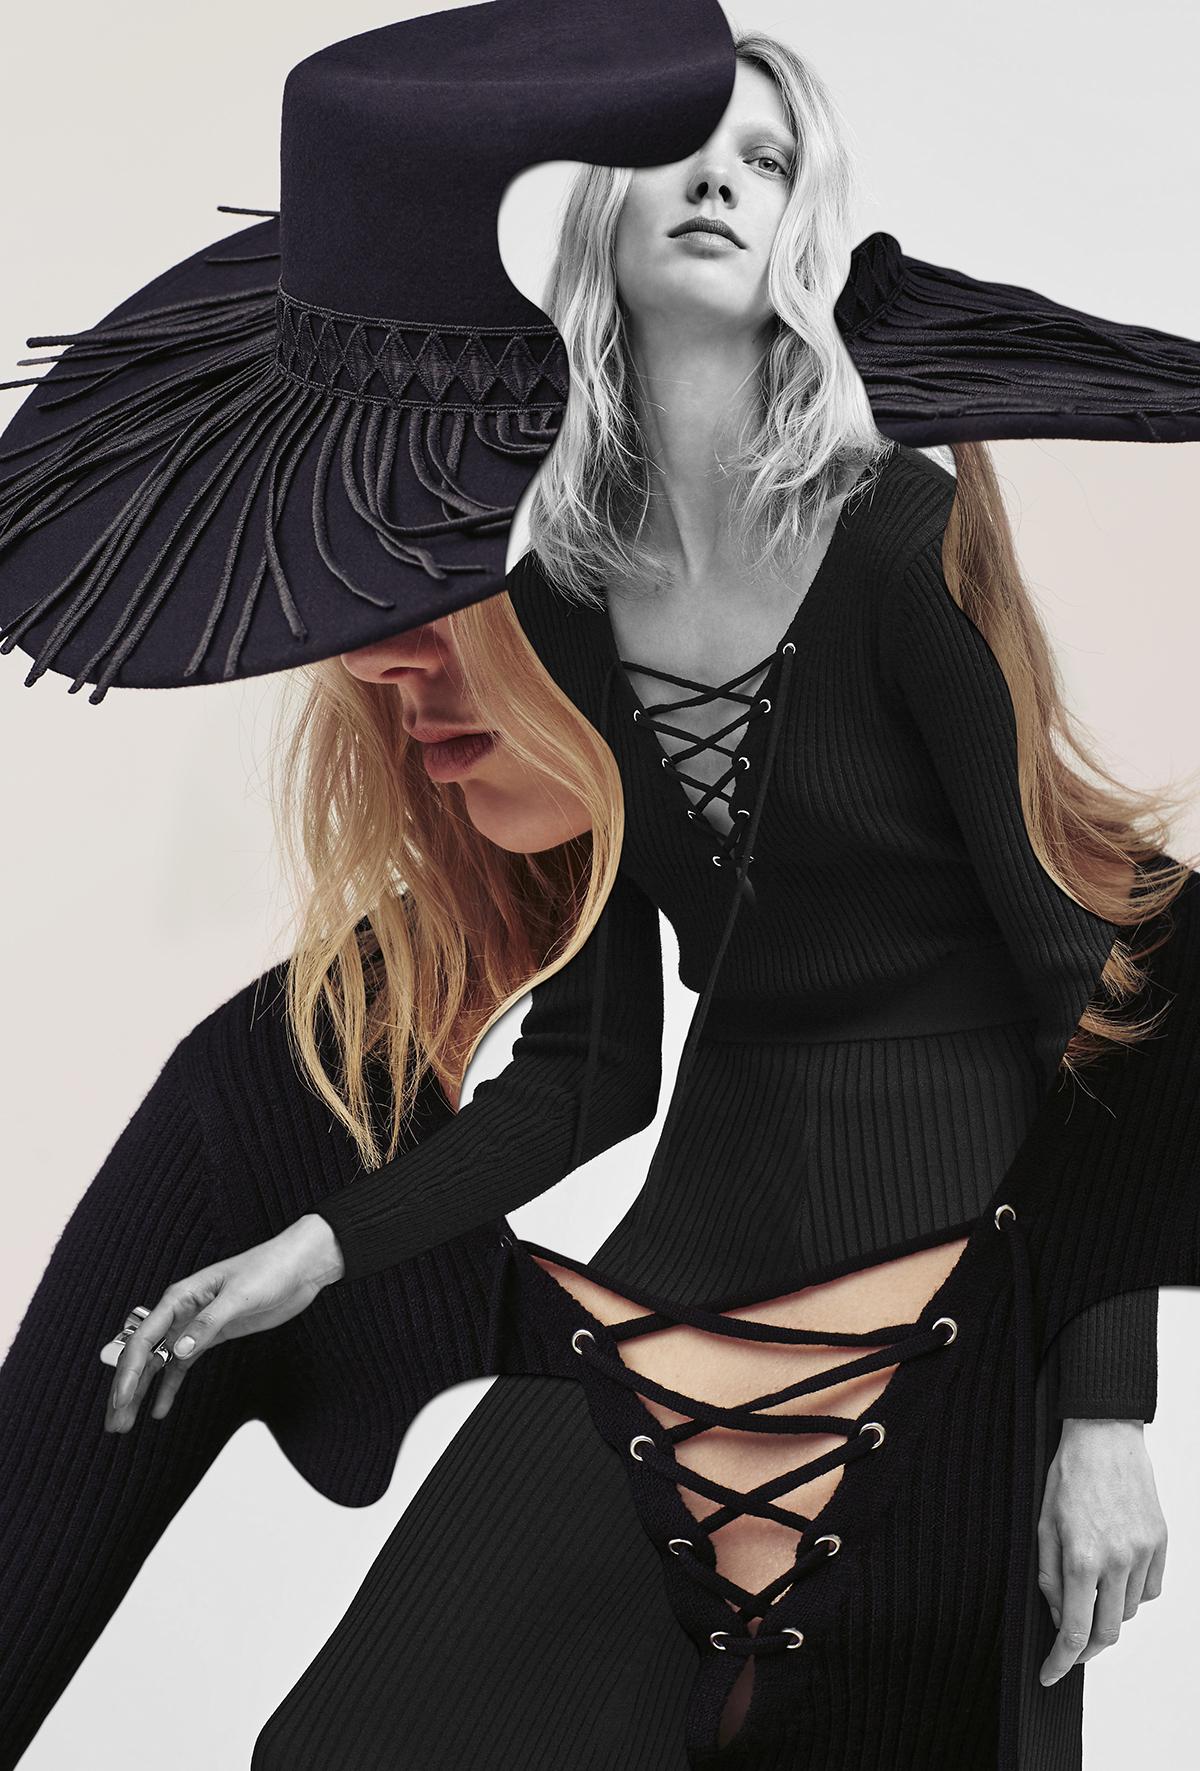 Pablo Thecuadro's Mastery of Fashion Photo Collages – Fubiz Media